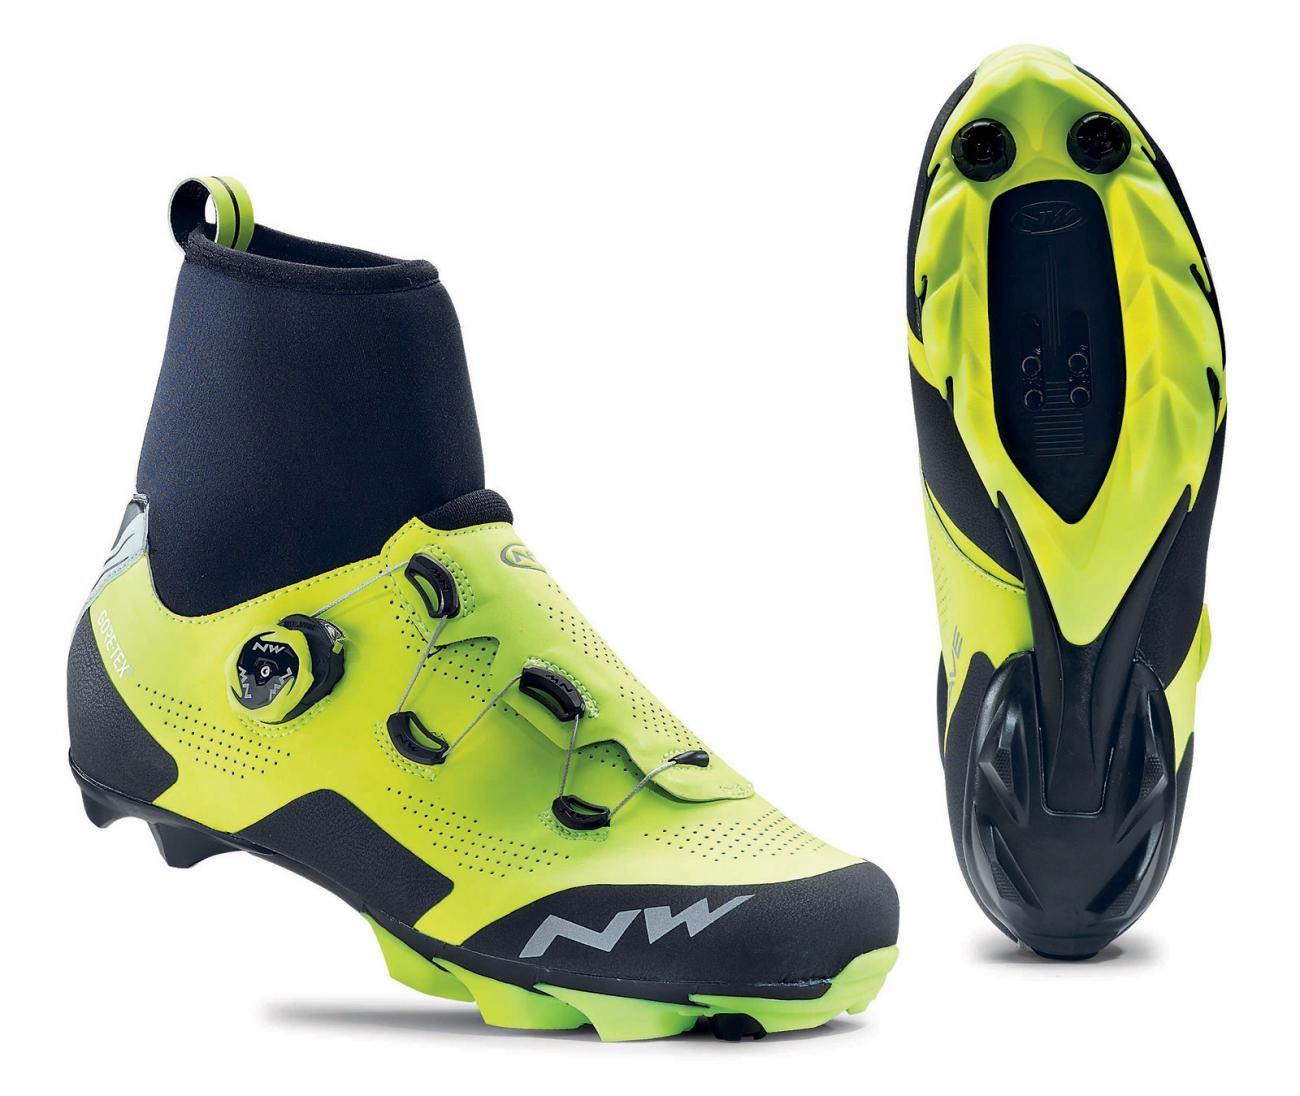 NORTHWAVE Man MTB XC shoes RAPTOR GTX yellow fluo/black